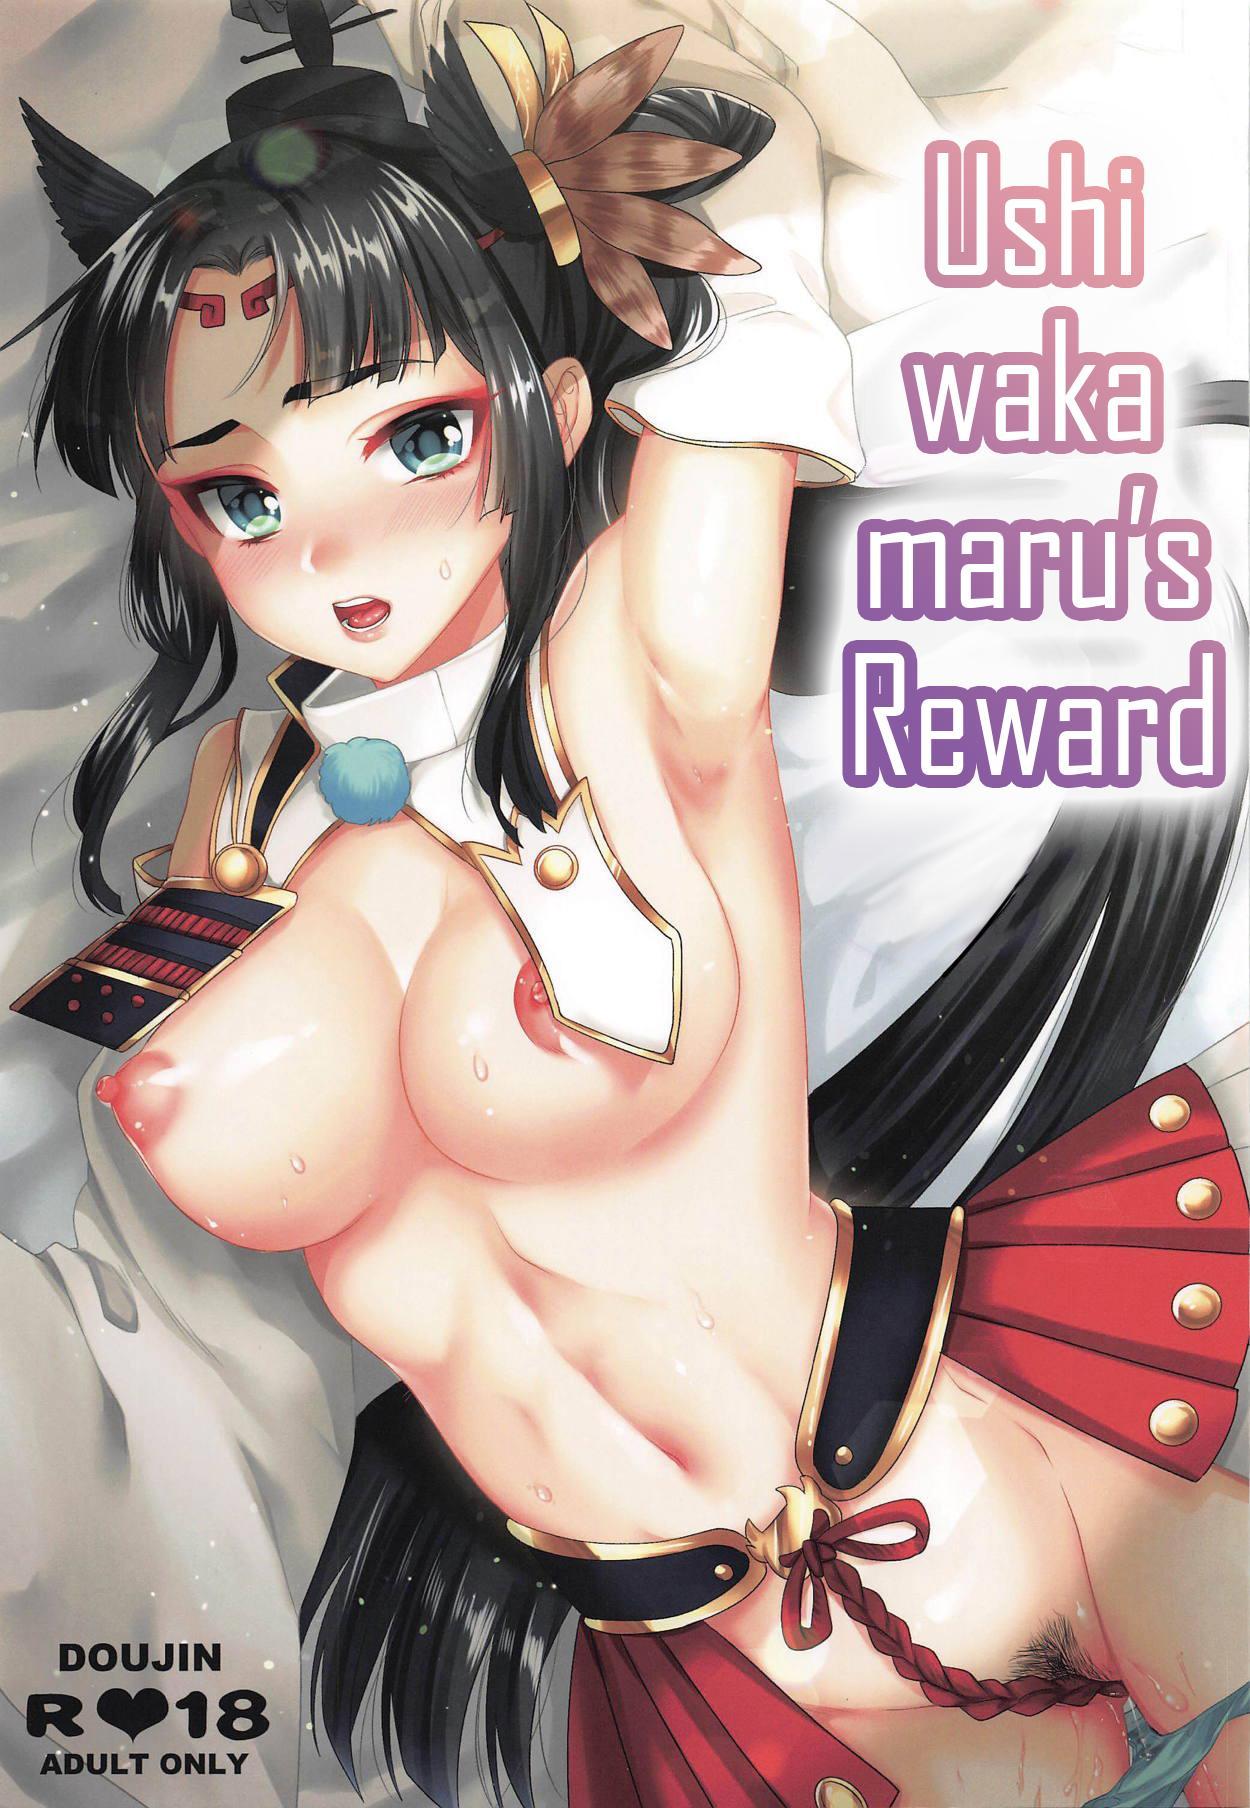 Ushiwakamaru no Gohoubi | Ushiwakamaru's Reward 0